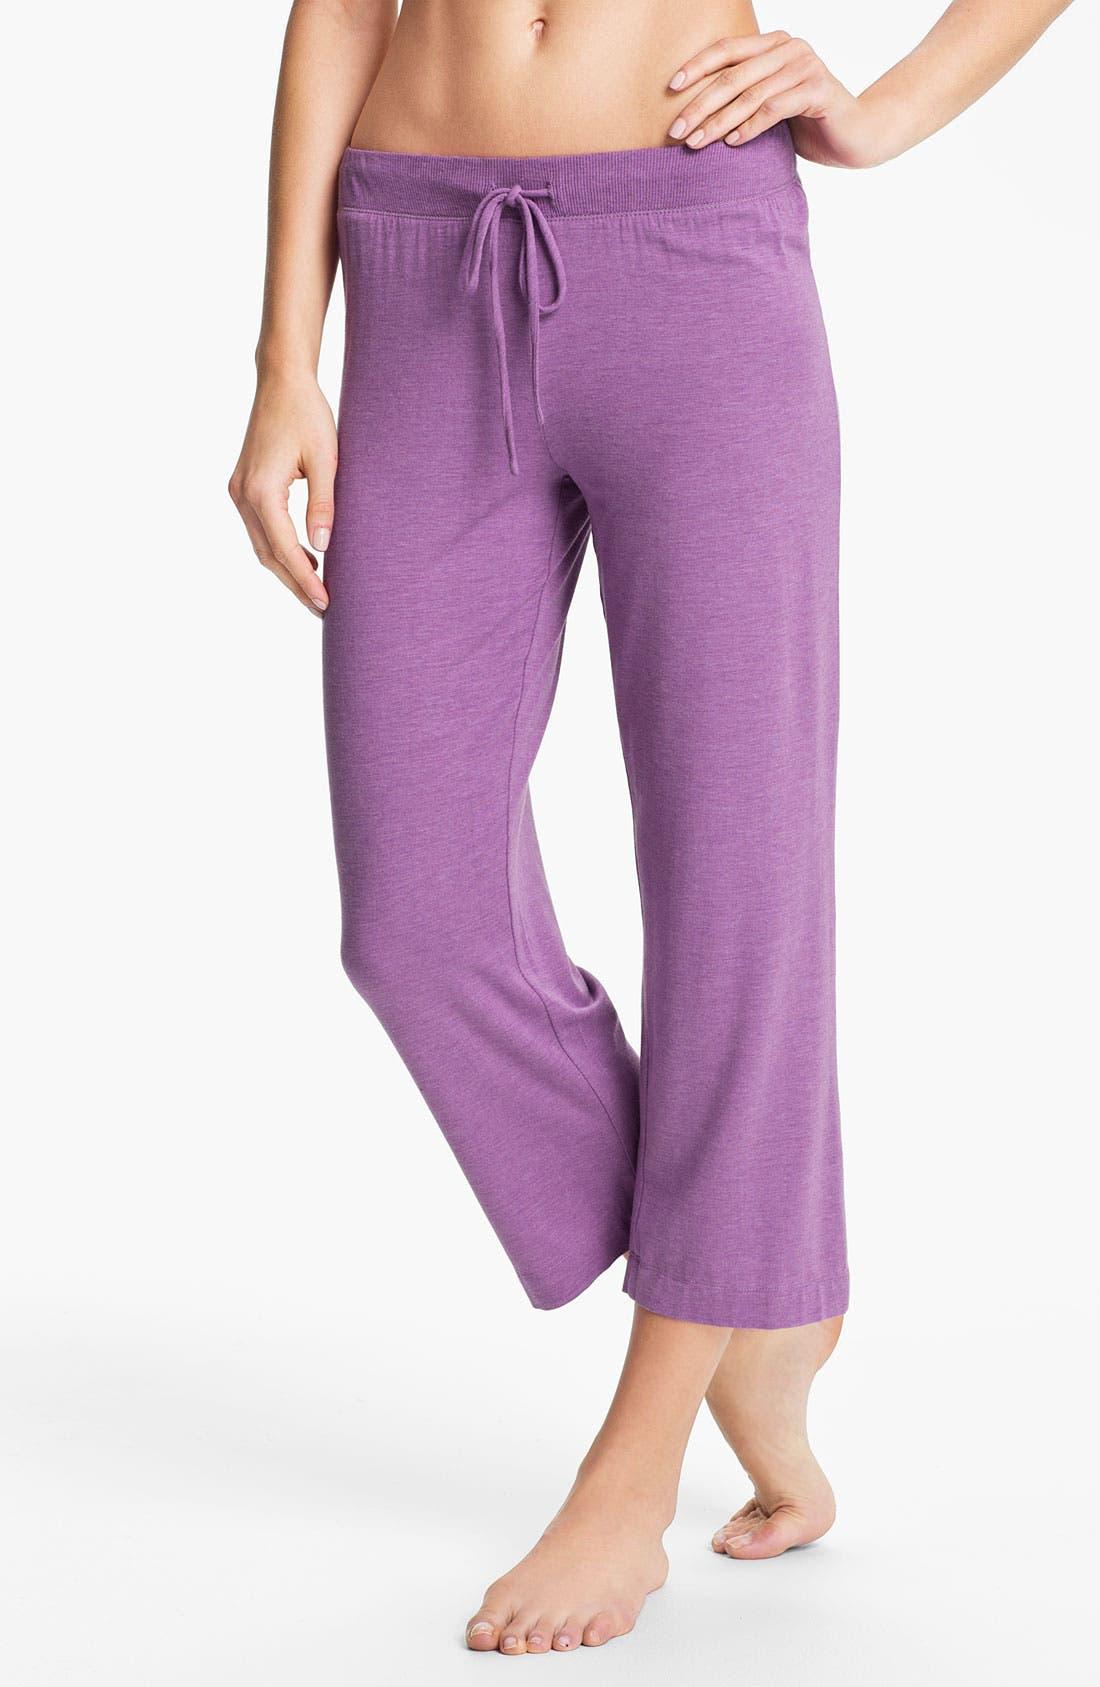 Alternate Image 1 Selected - DKNY '7 Easy Pieces' Capri Pants